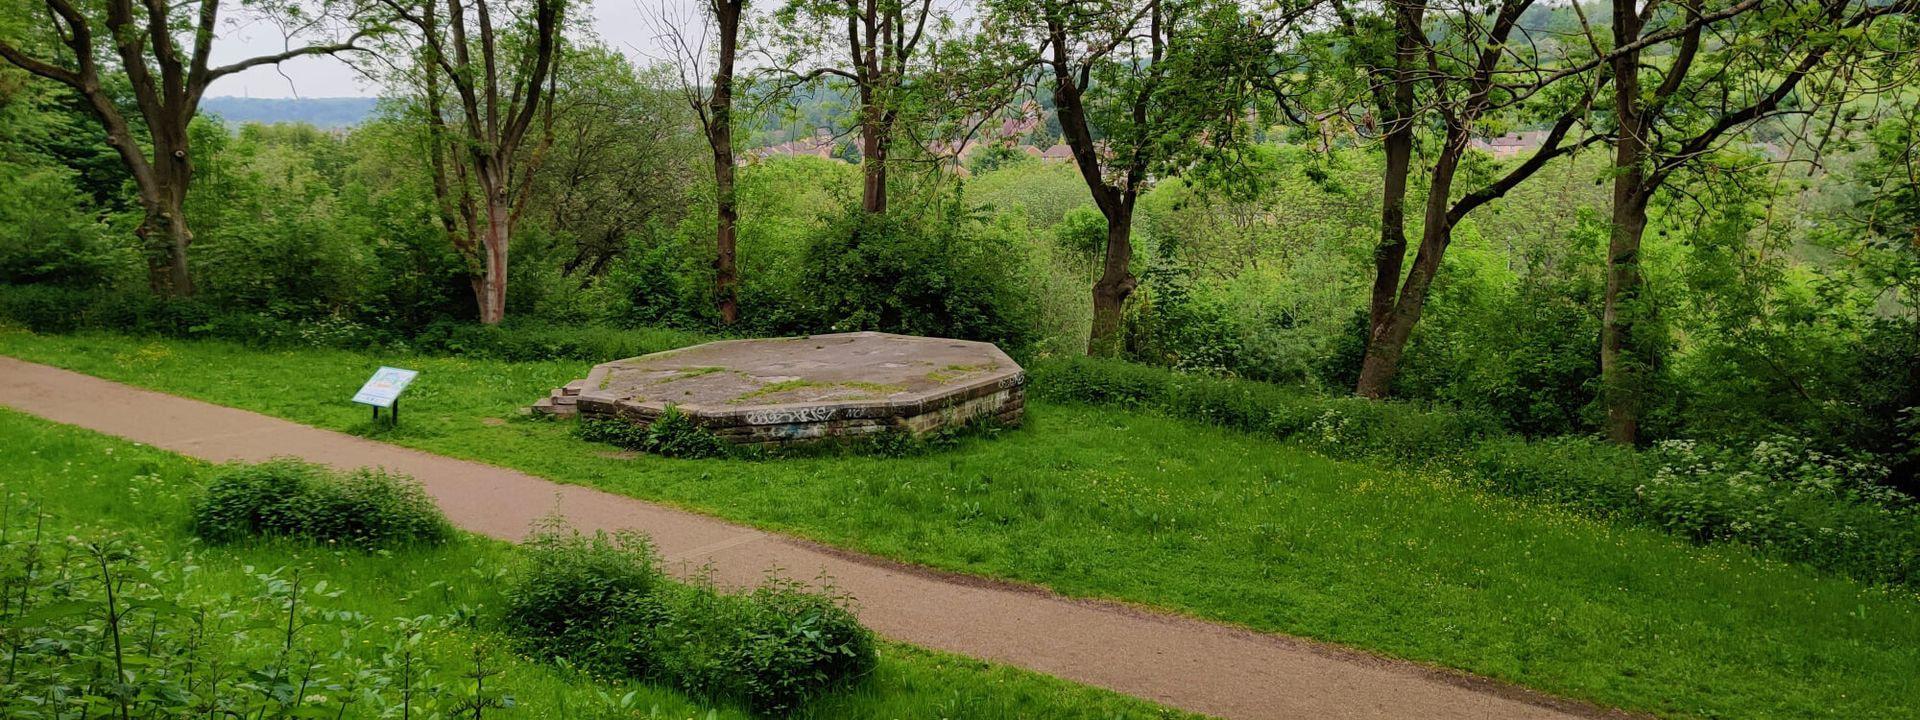 Woodhouse Ridge bandstand